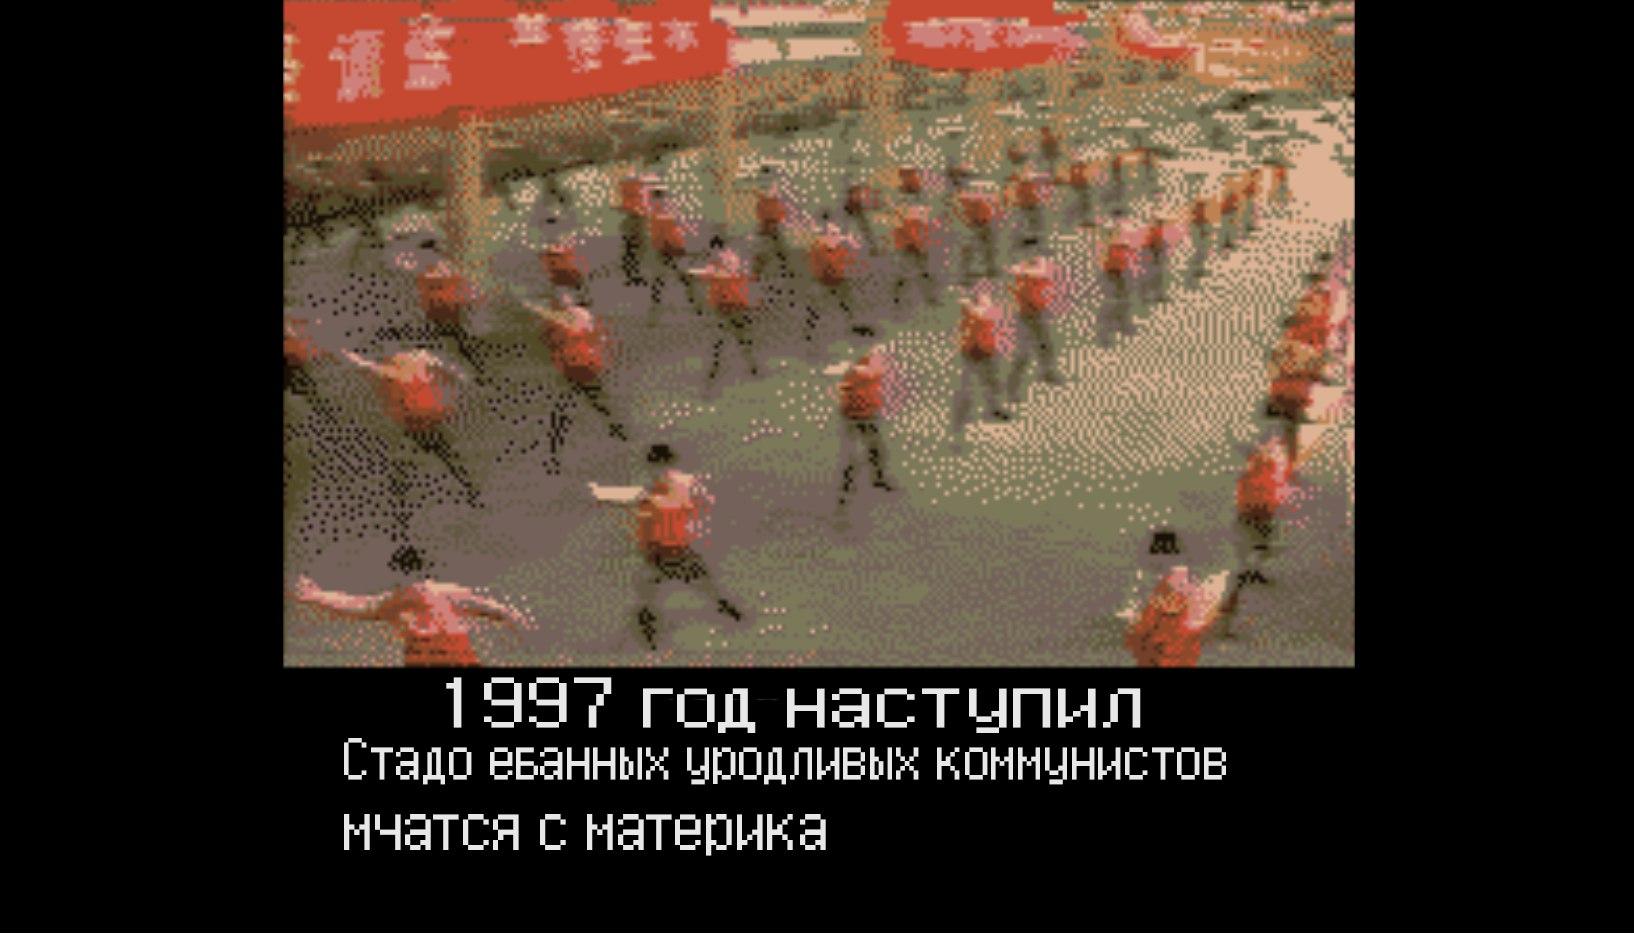 https://pp.userapi.com/c840134/v840134464/267b2/l3Hfh9SzE8Y.jpg